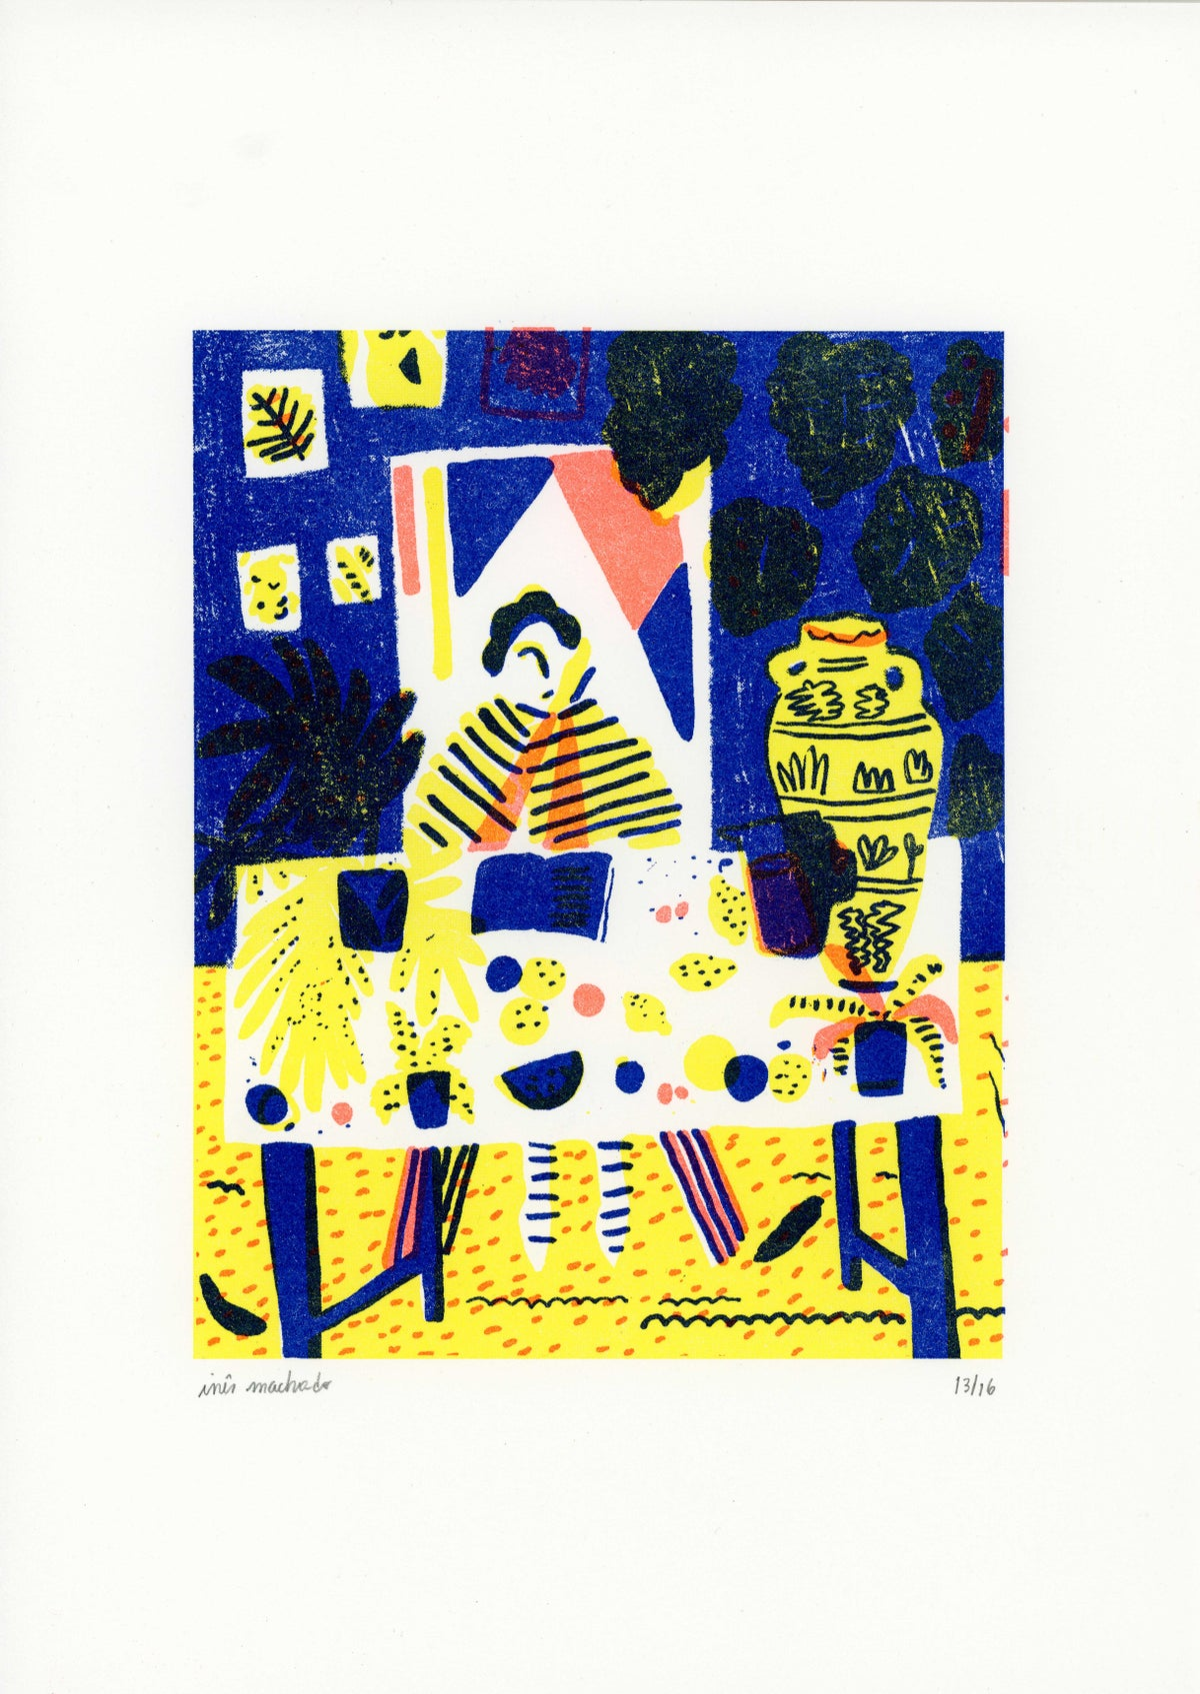 Image of Matisse